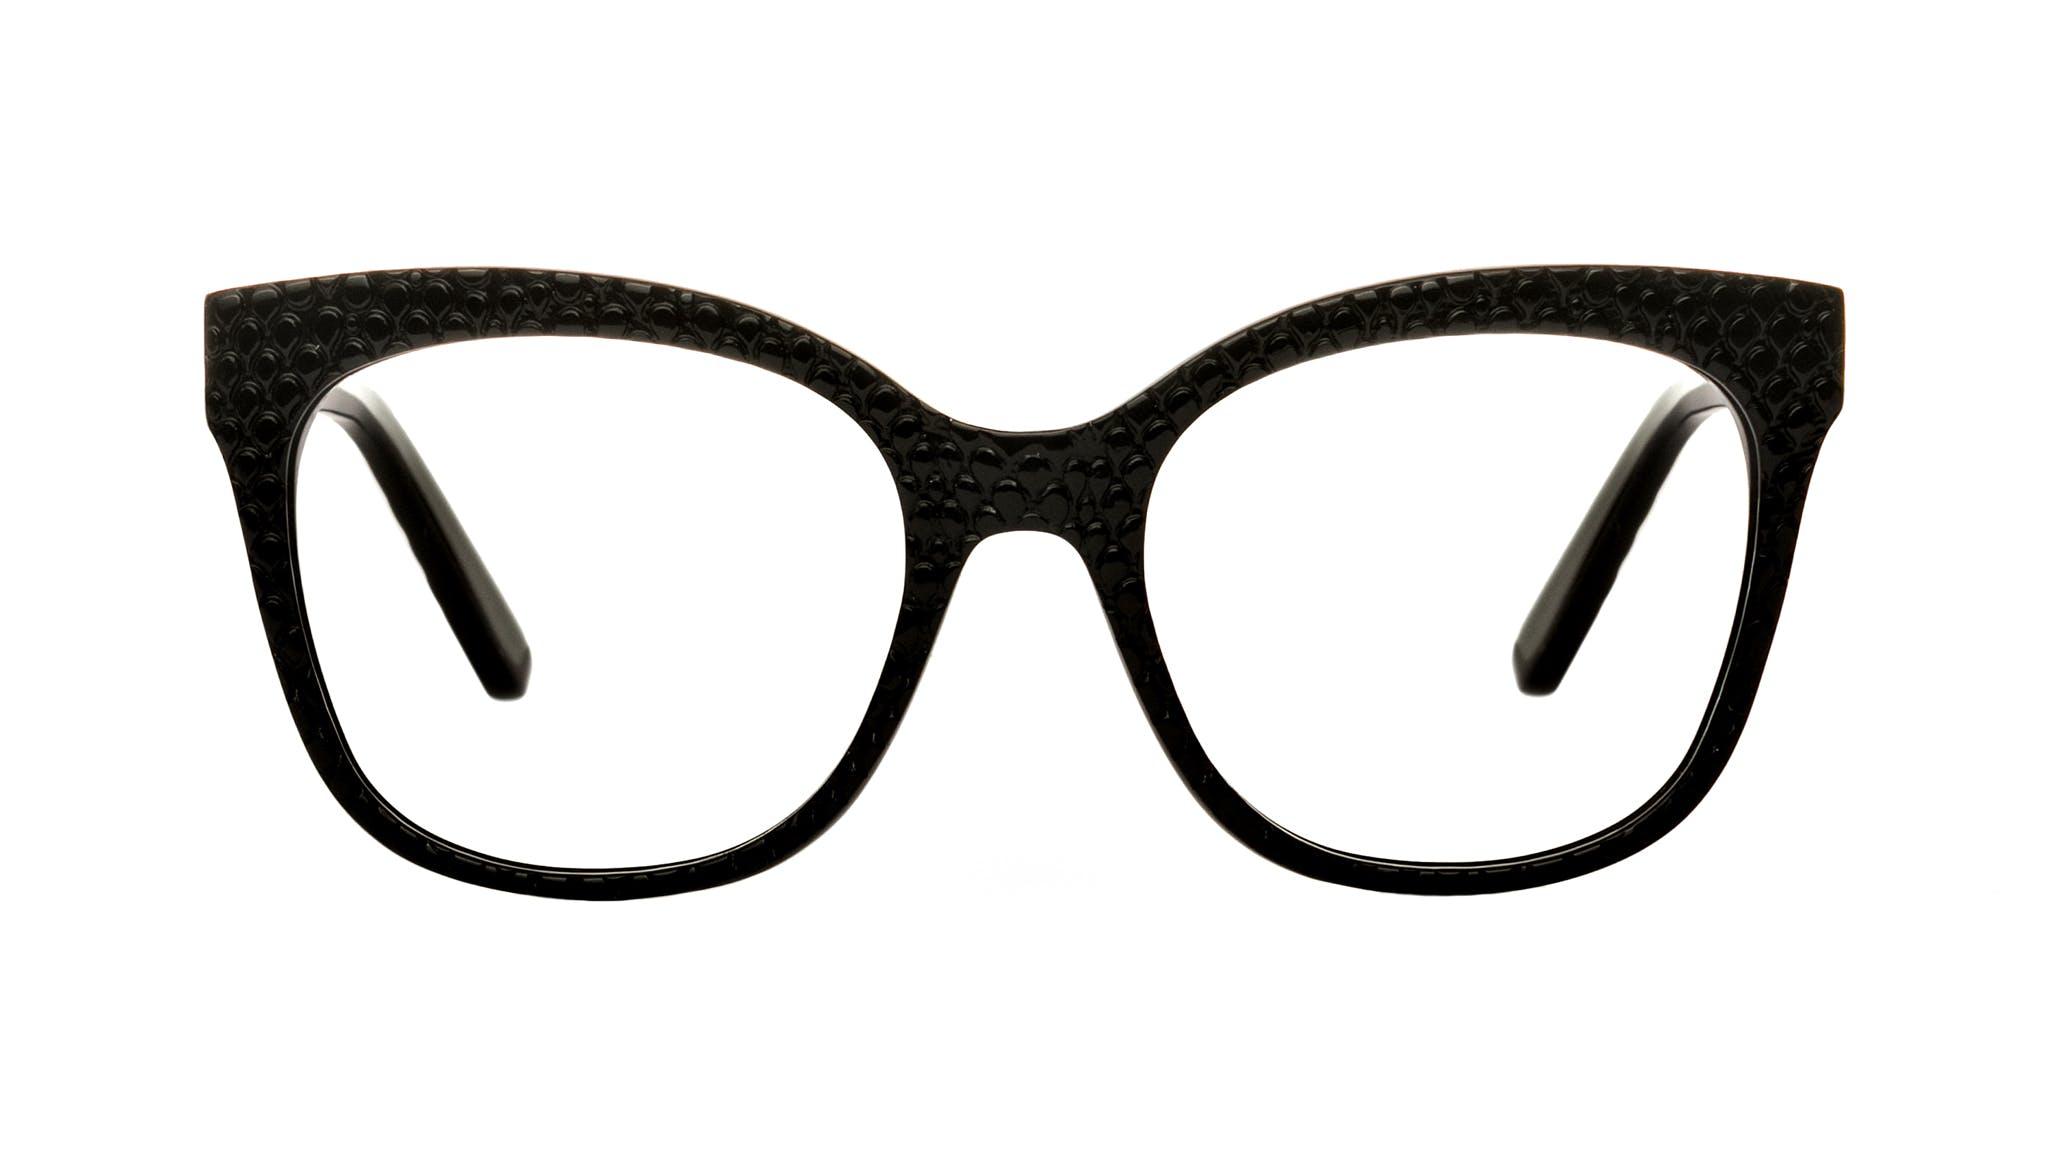 Affordable Fashion Glasses Square Eyeglasses Women Breezy Croco Front